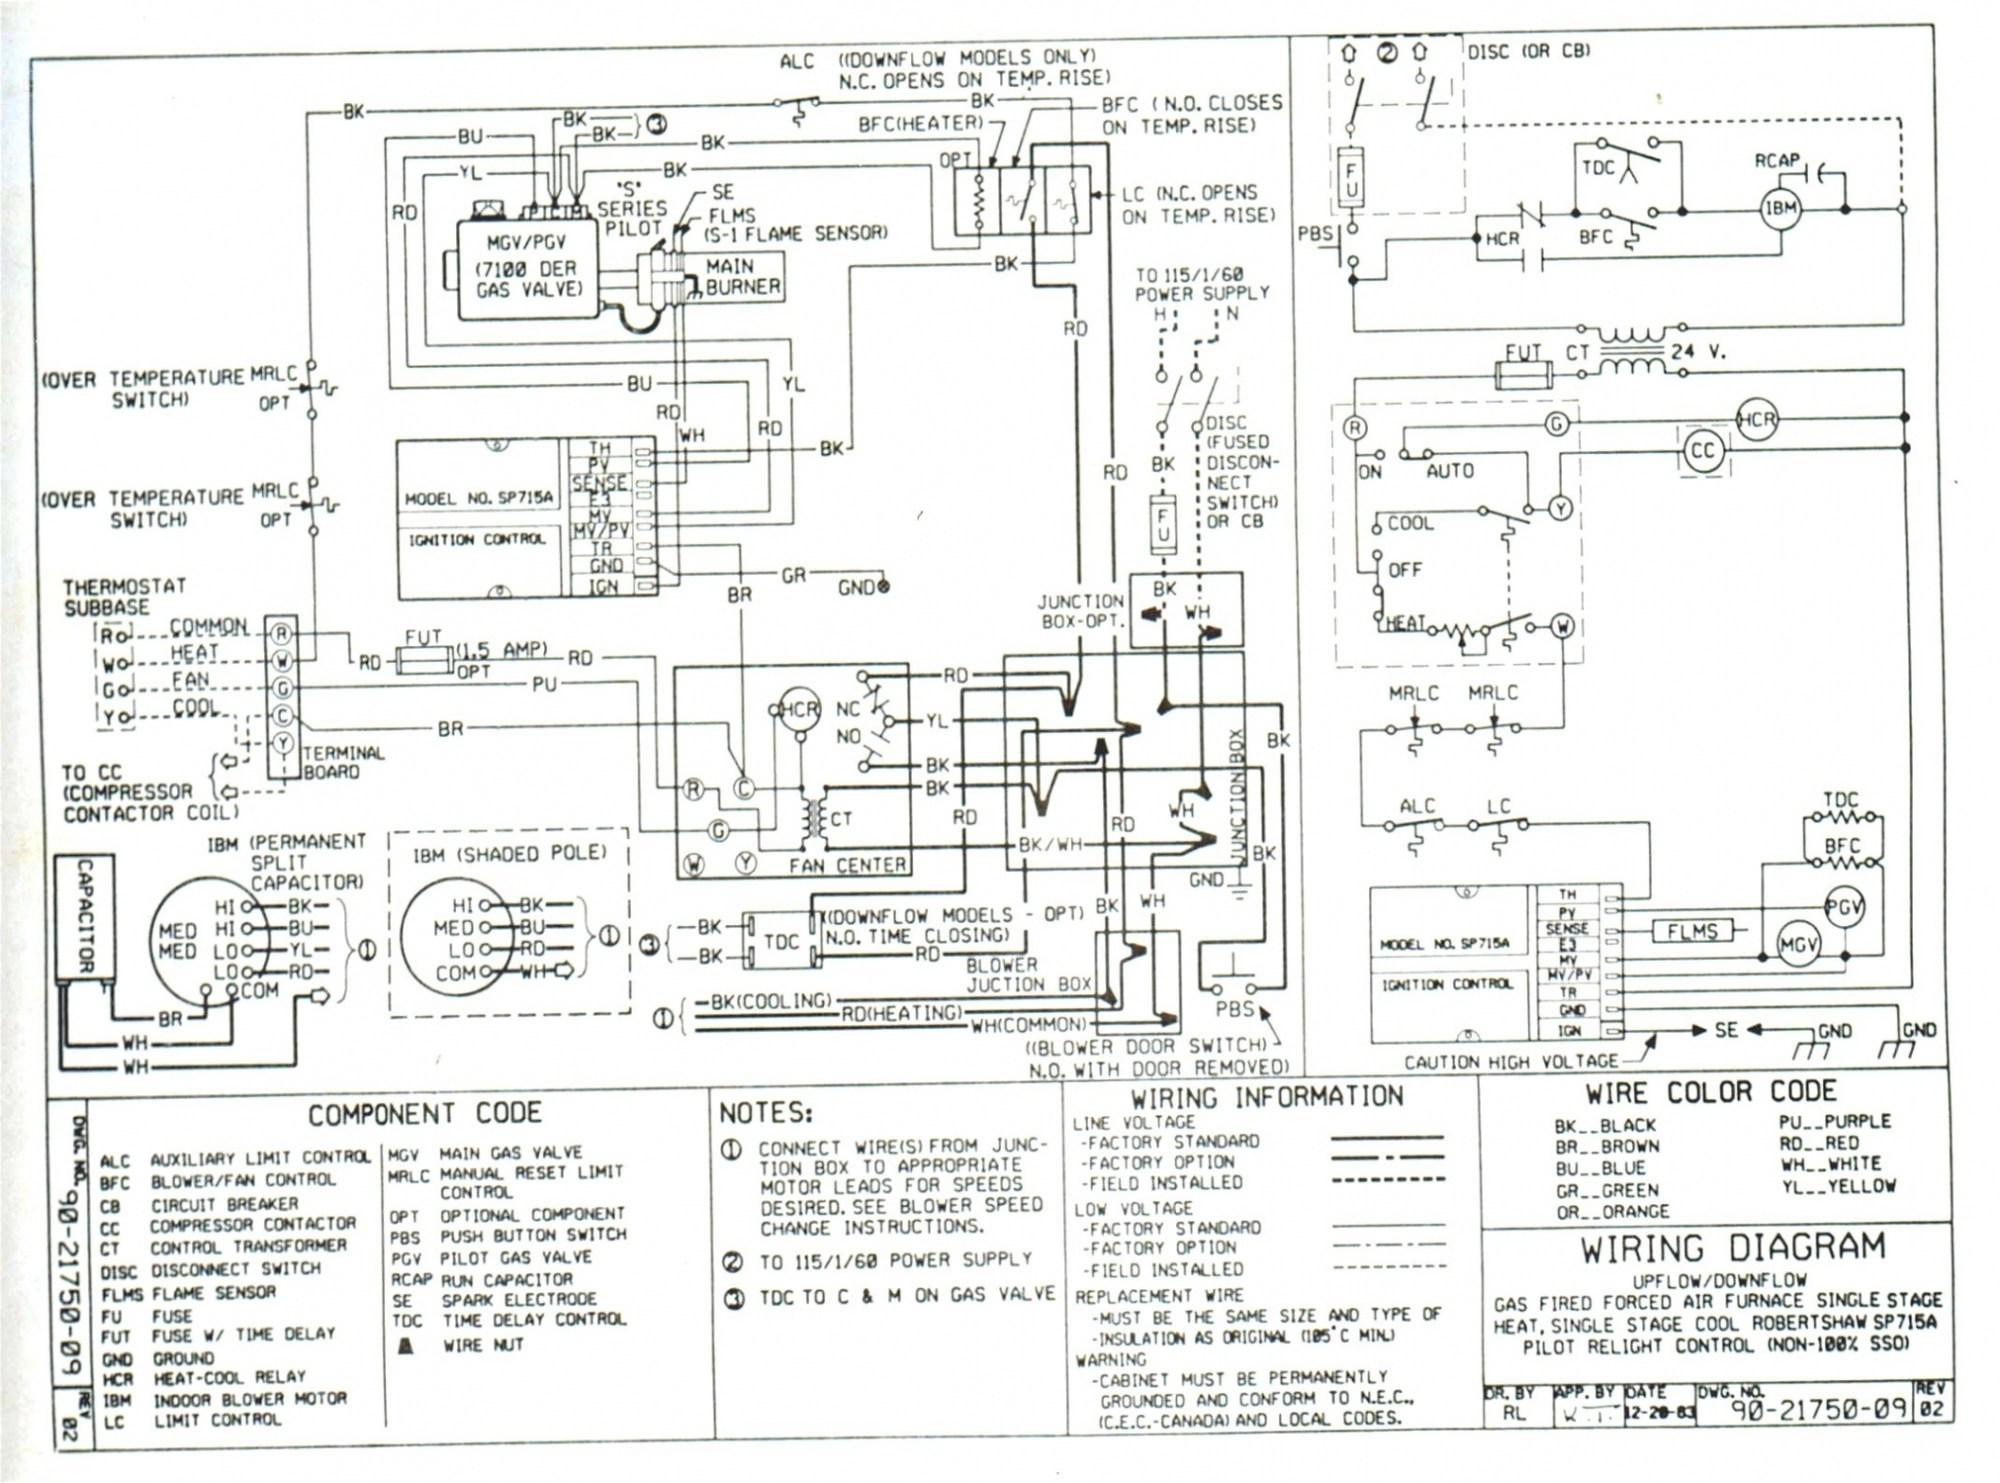 hight resolution of goodman air handler fan relay wiring diagram free picture wiring air handler fan relay wiring diagram